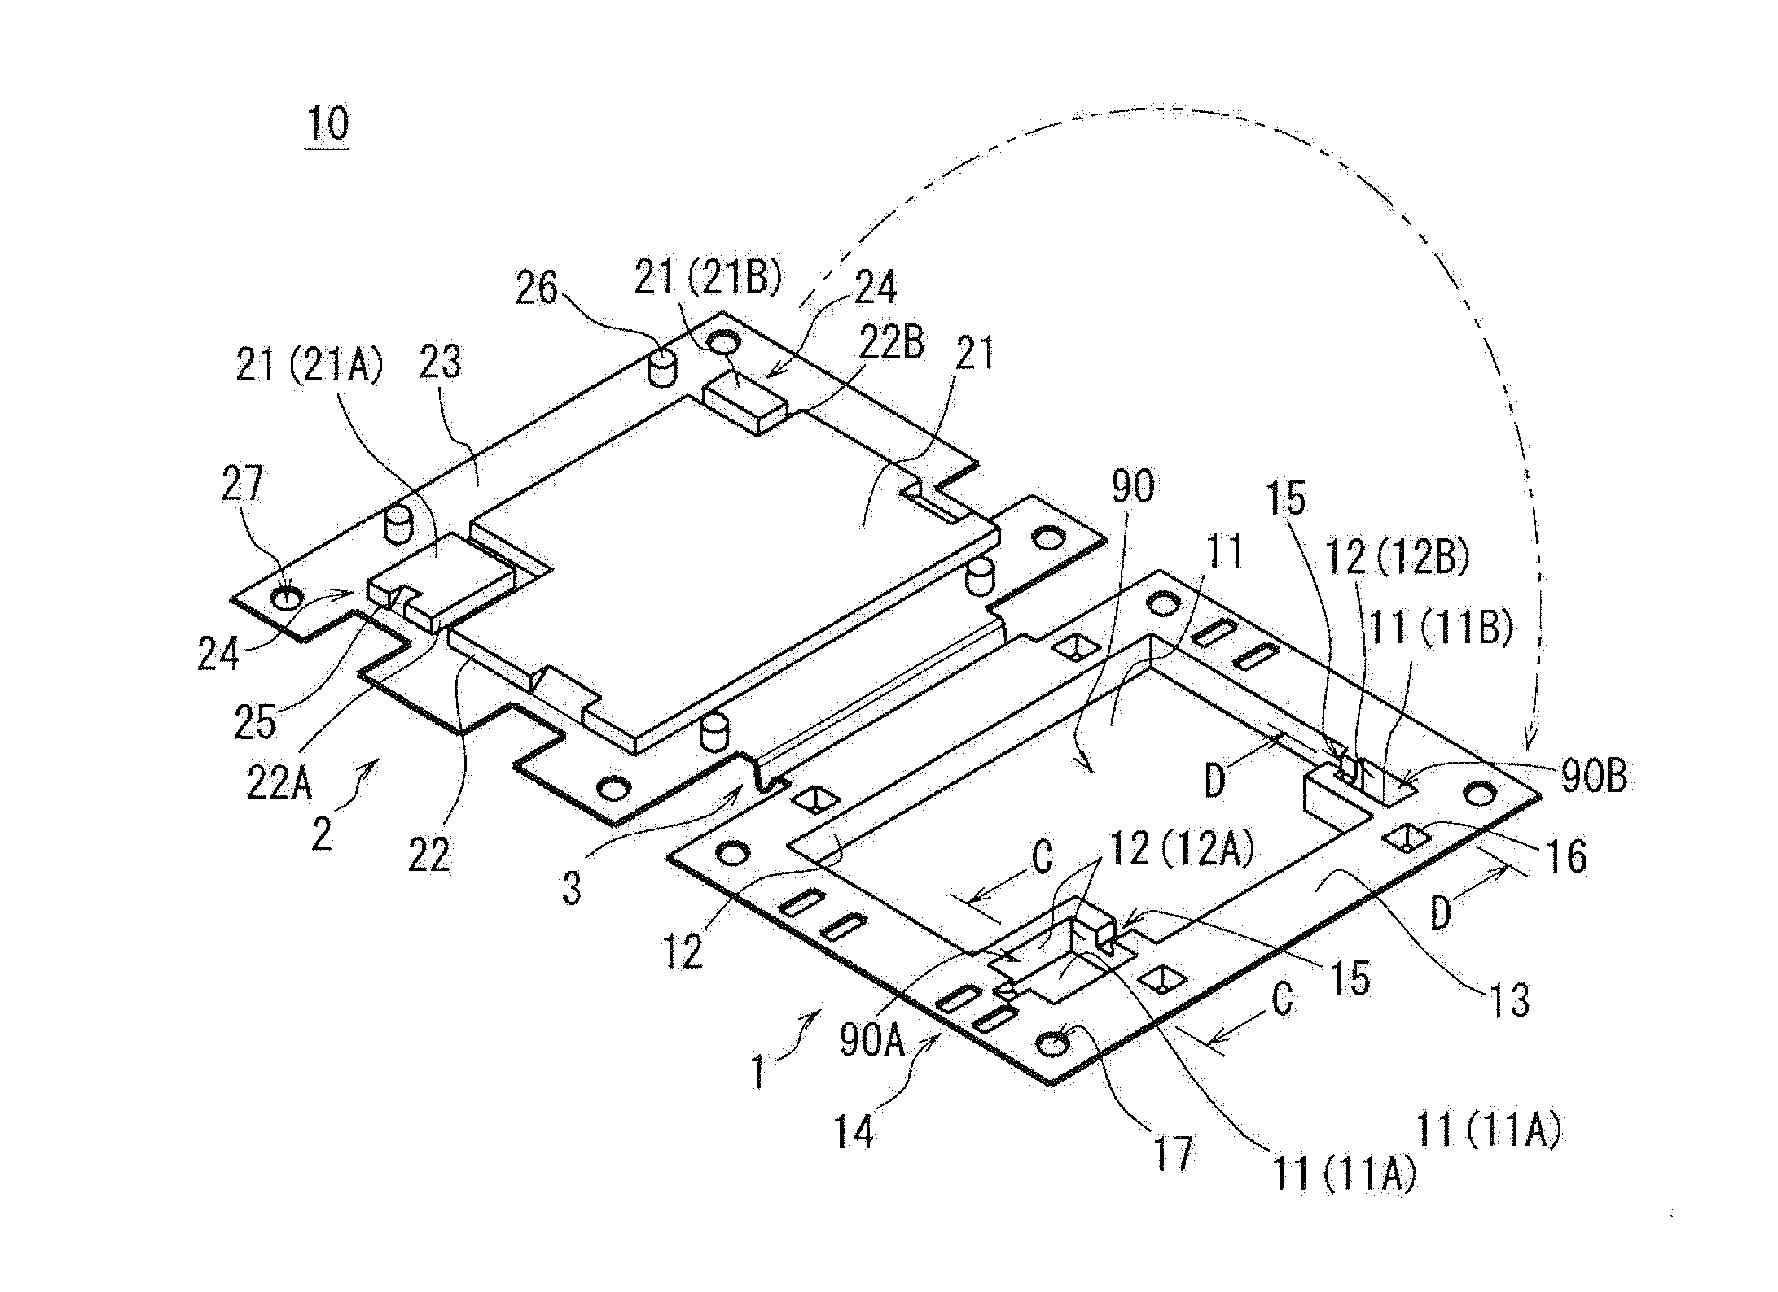 fahrenheit electric baseboard wiring diagram